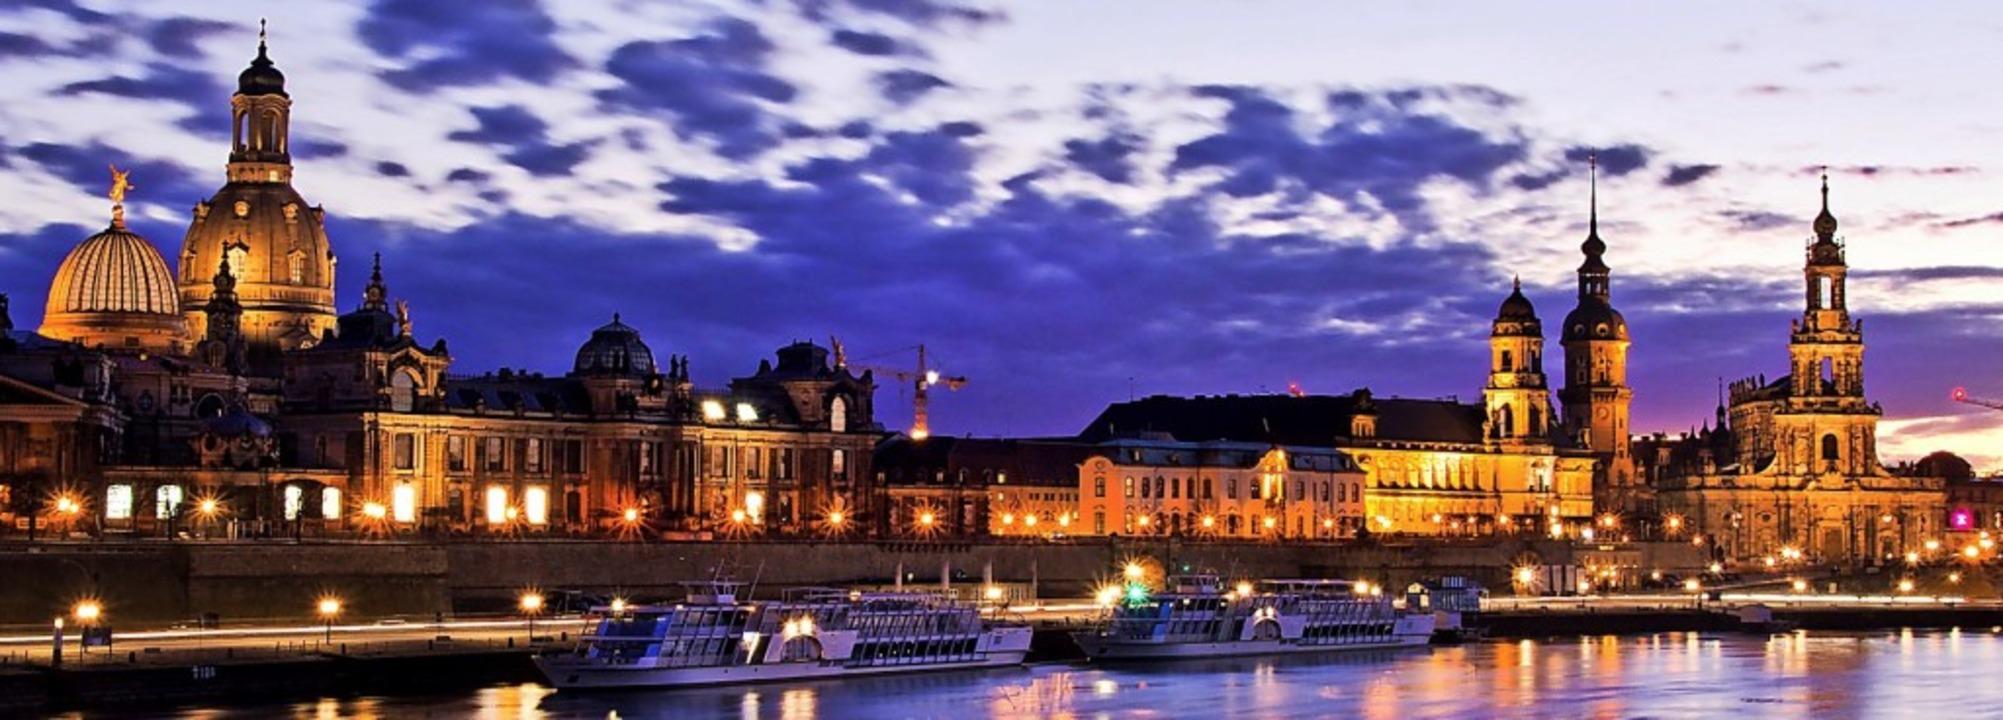 Dresdens weltberühmtes Barockensemble an der Elbe    Foto: Sebastian127 (pixabay.com)